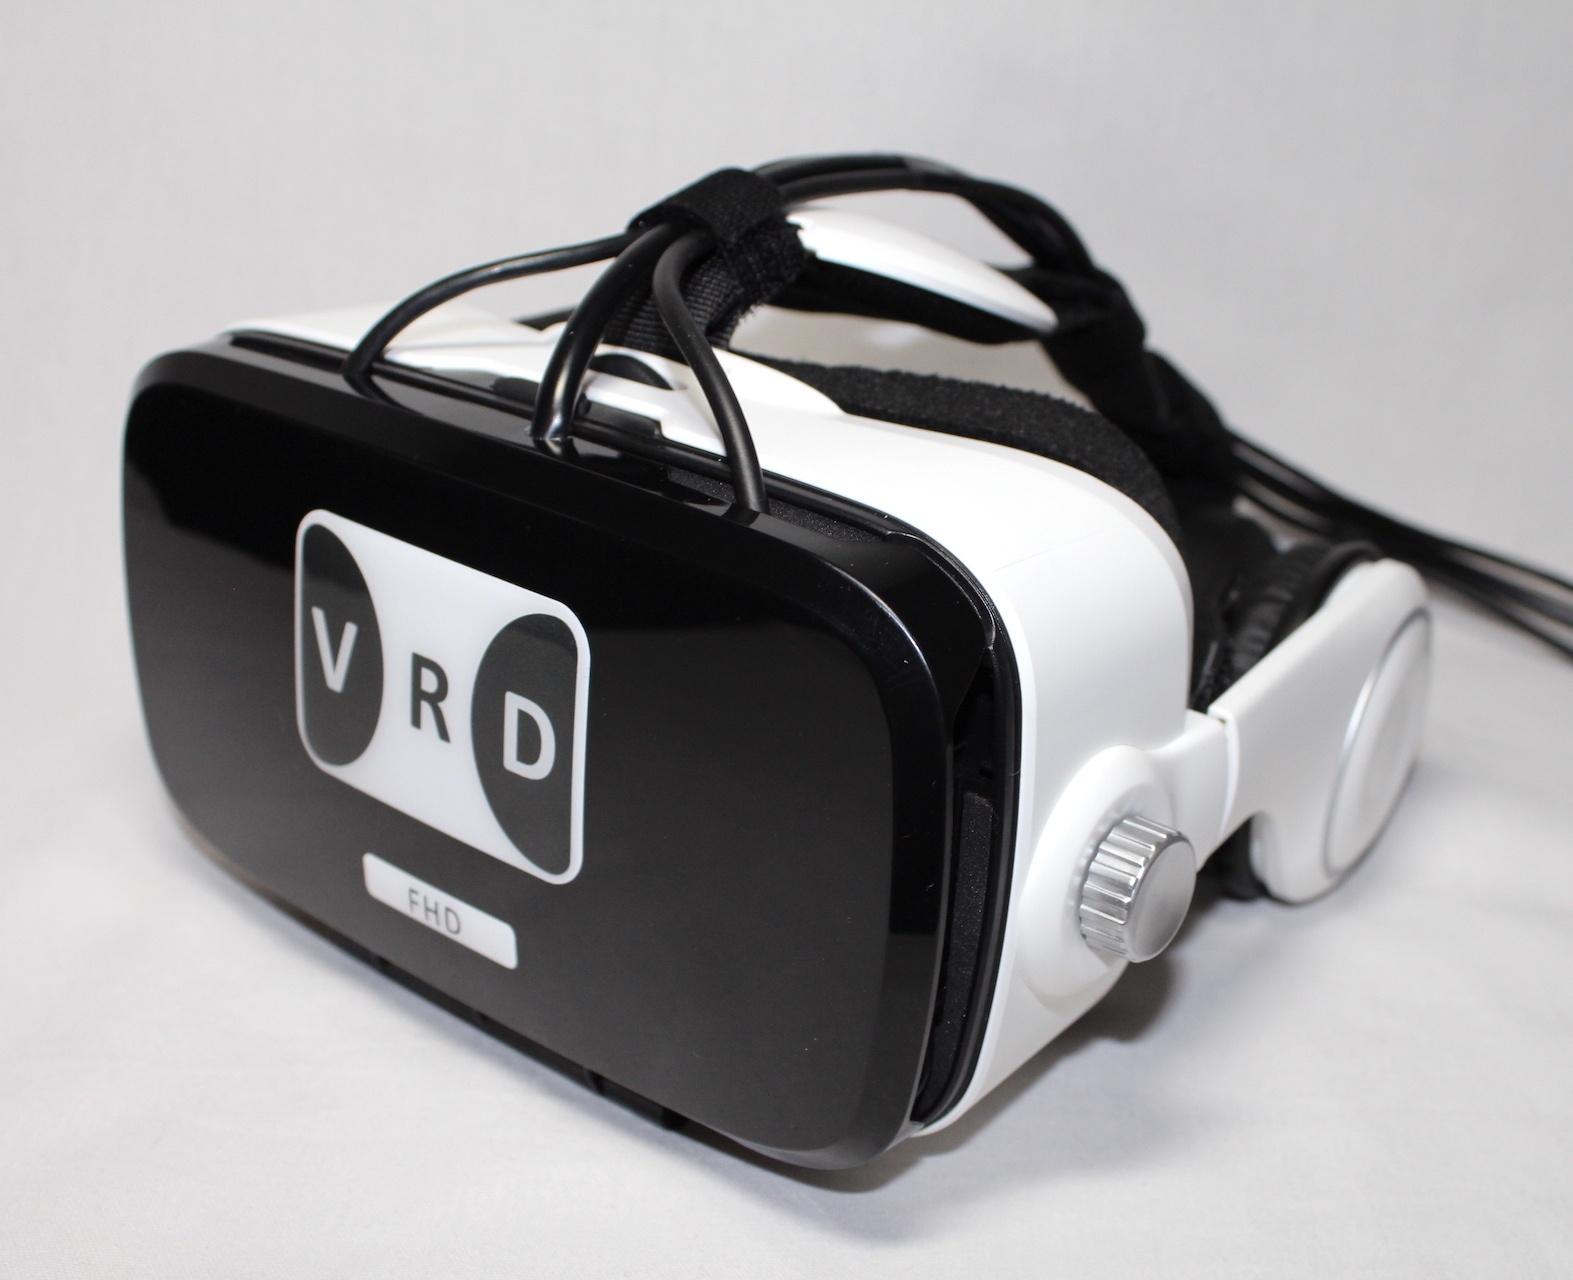 Шлем виртуальной реальности VRD Z4 - 1